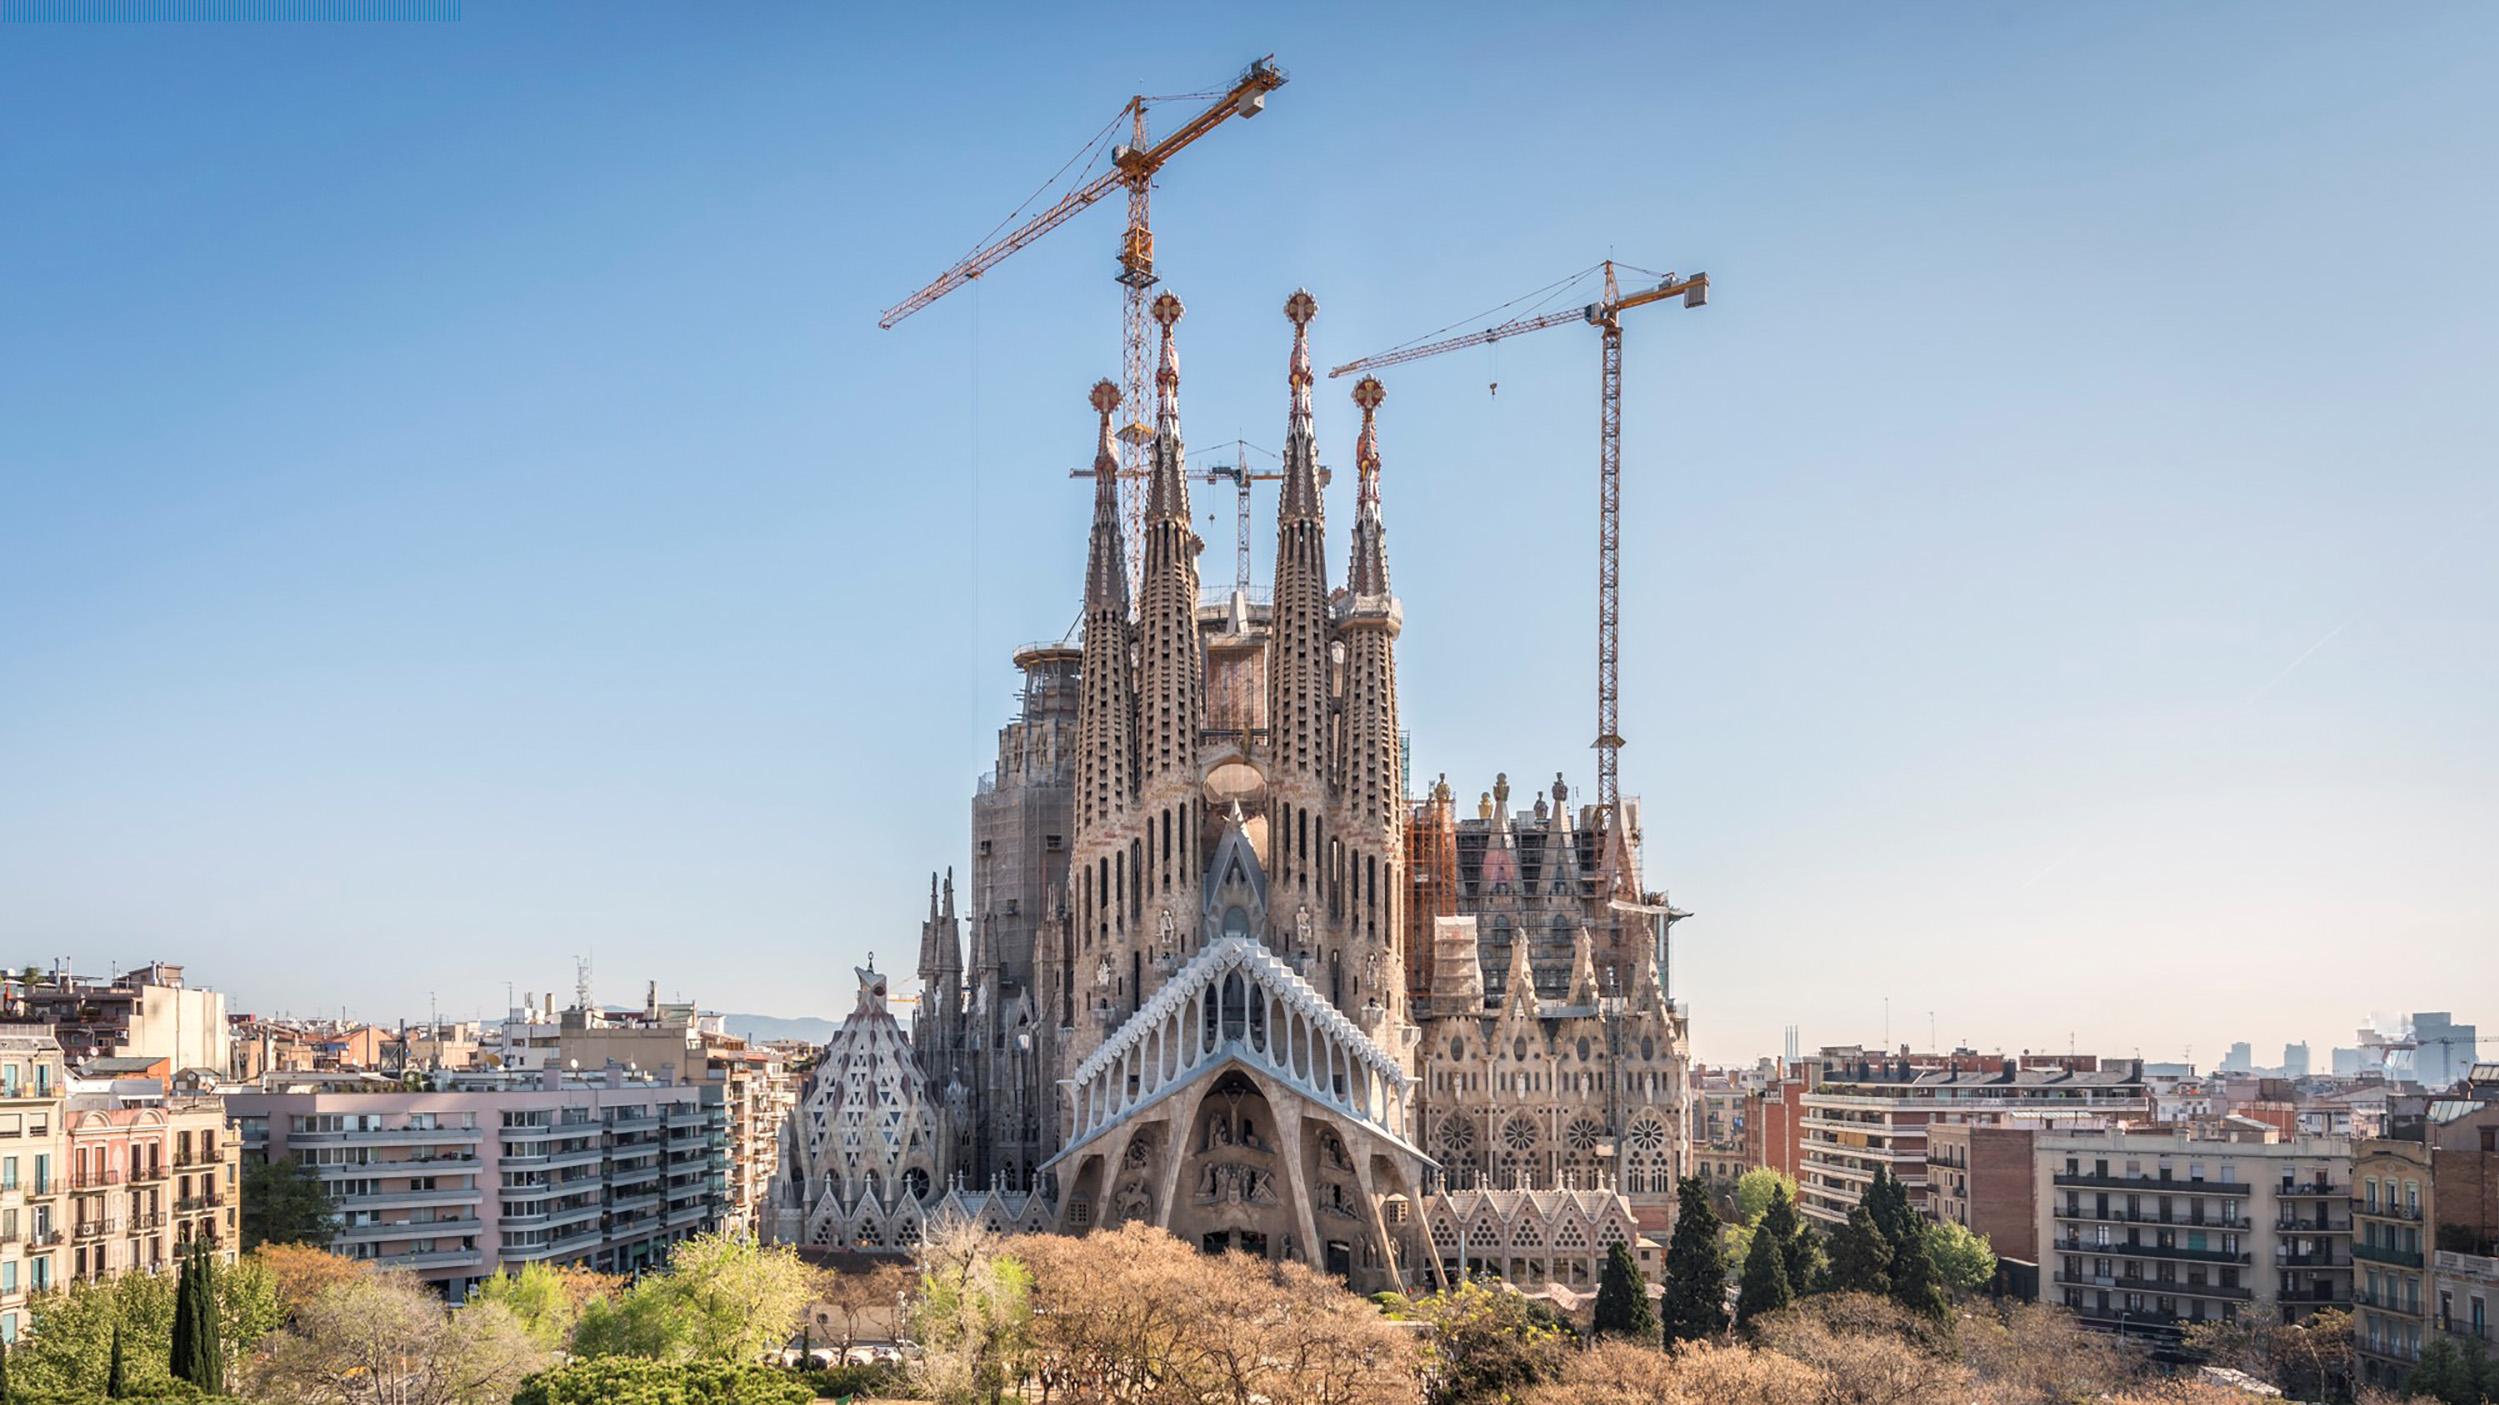 Sagrada-Familia-2000x1125-2